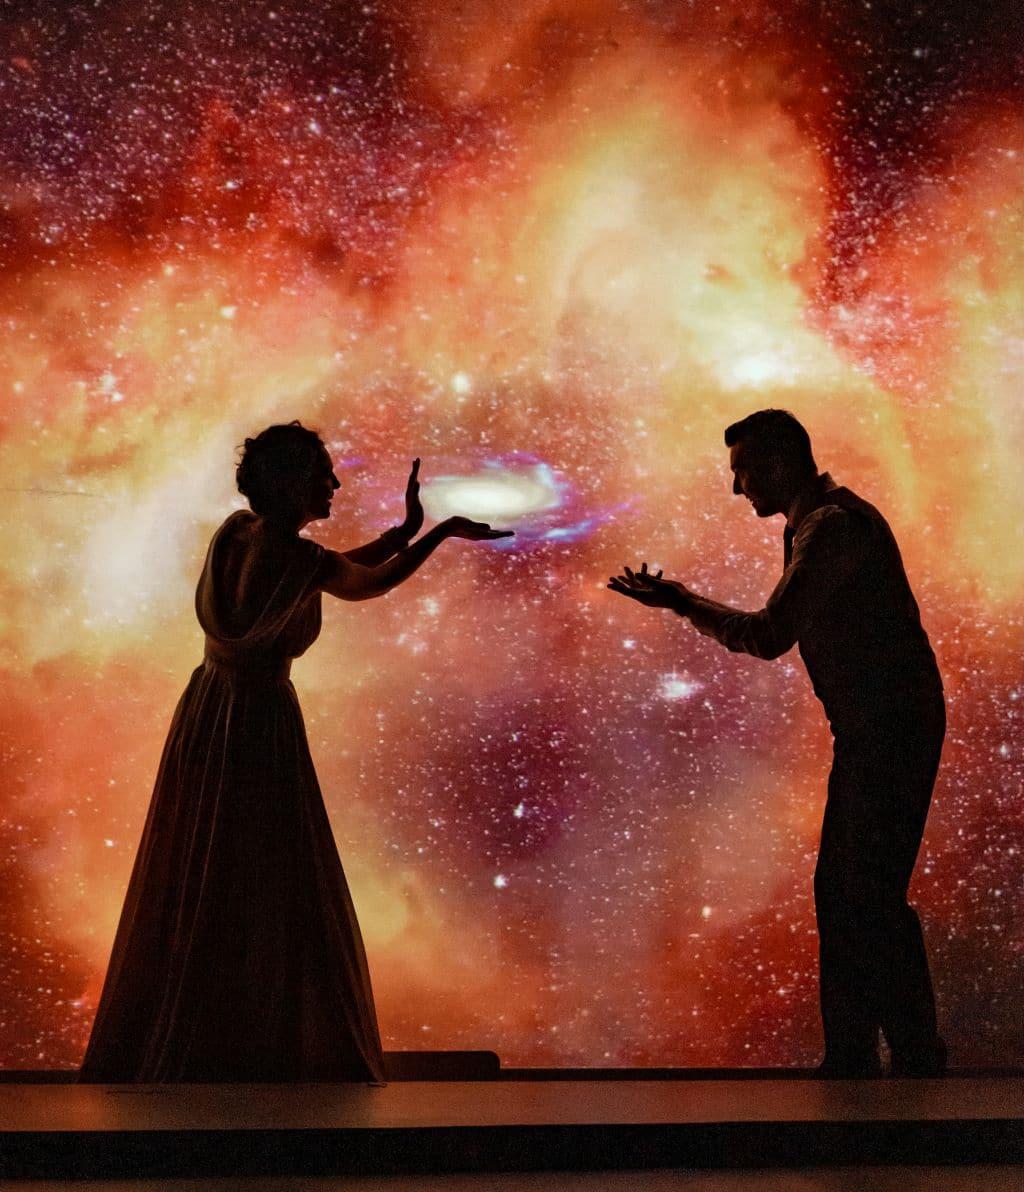 Steaua fara nume foto credit TNRS Vlad Dumitru